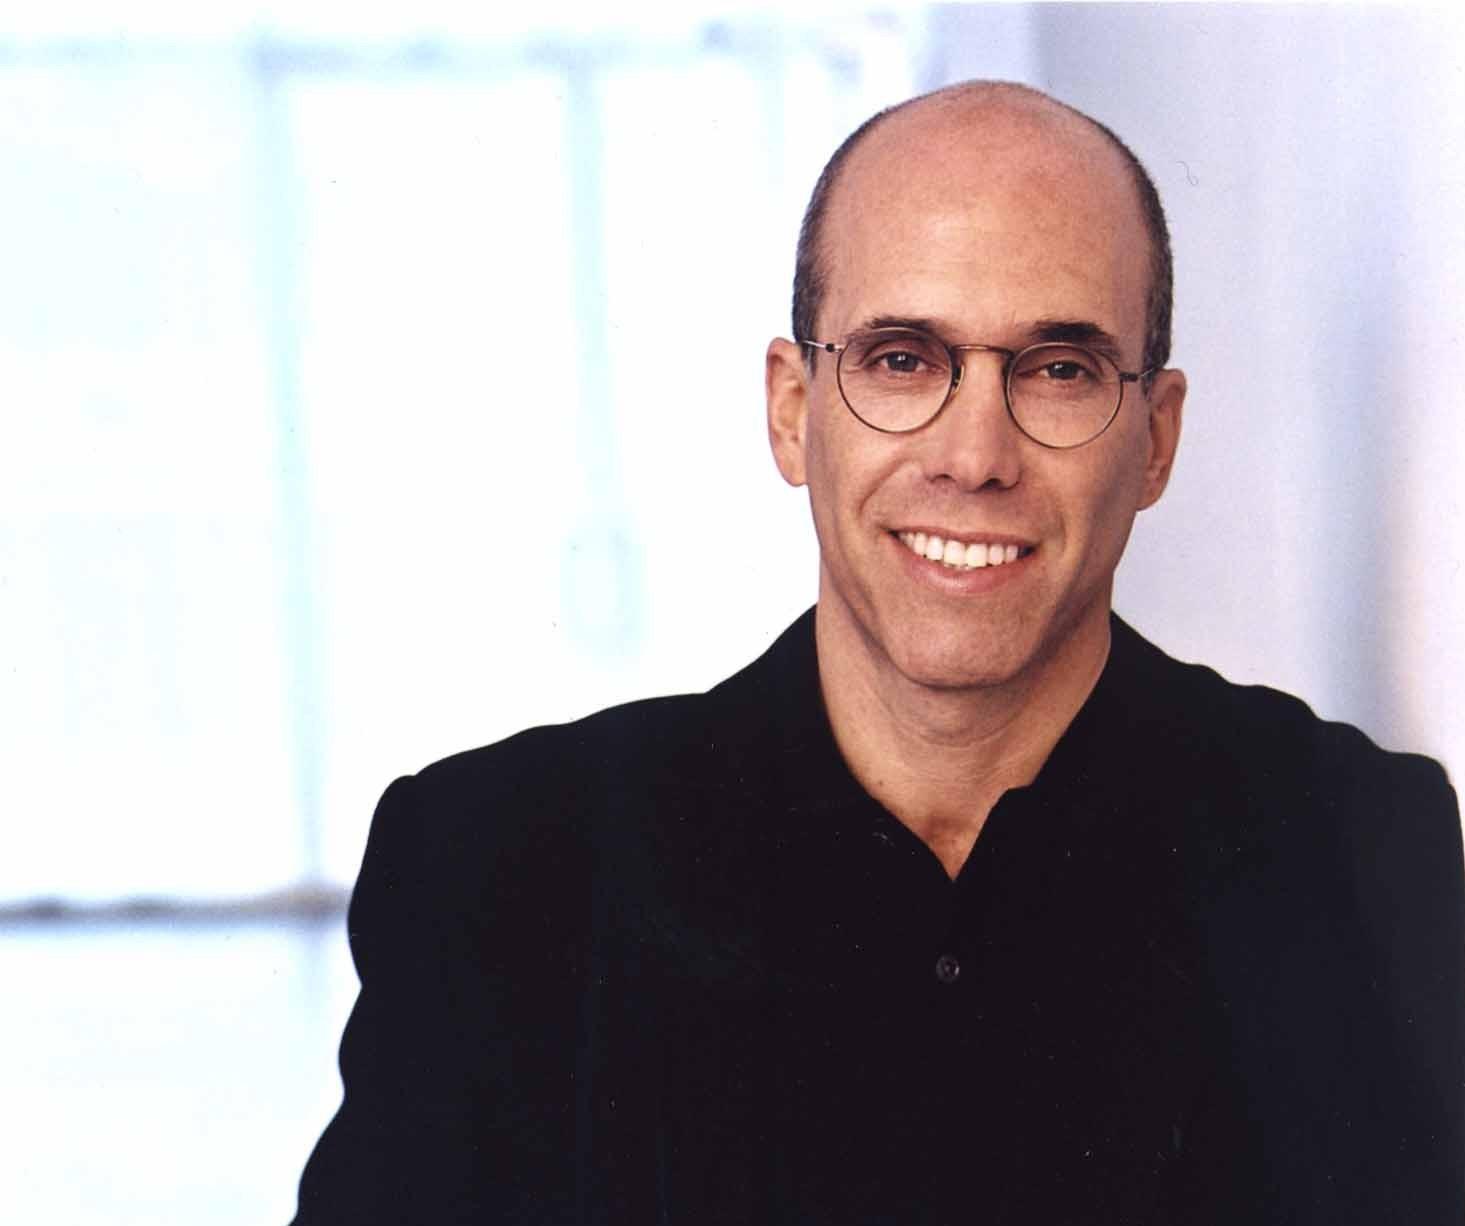 Jeffrey Katzenberg Eroded Animation with Celebrities